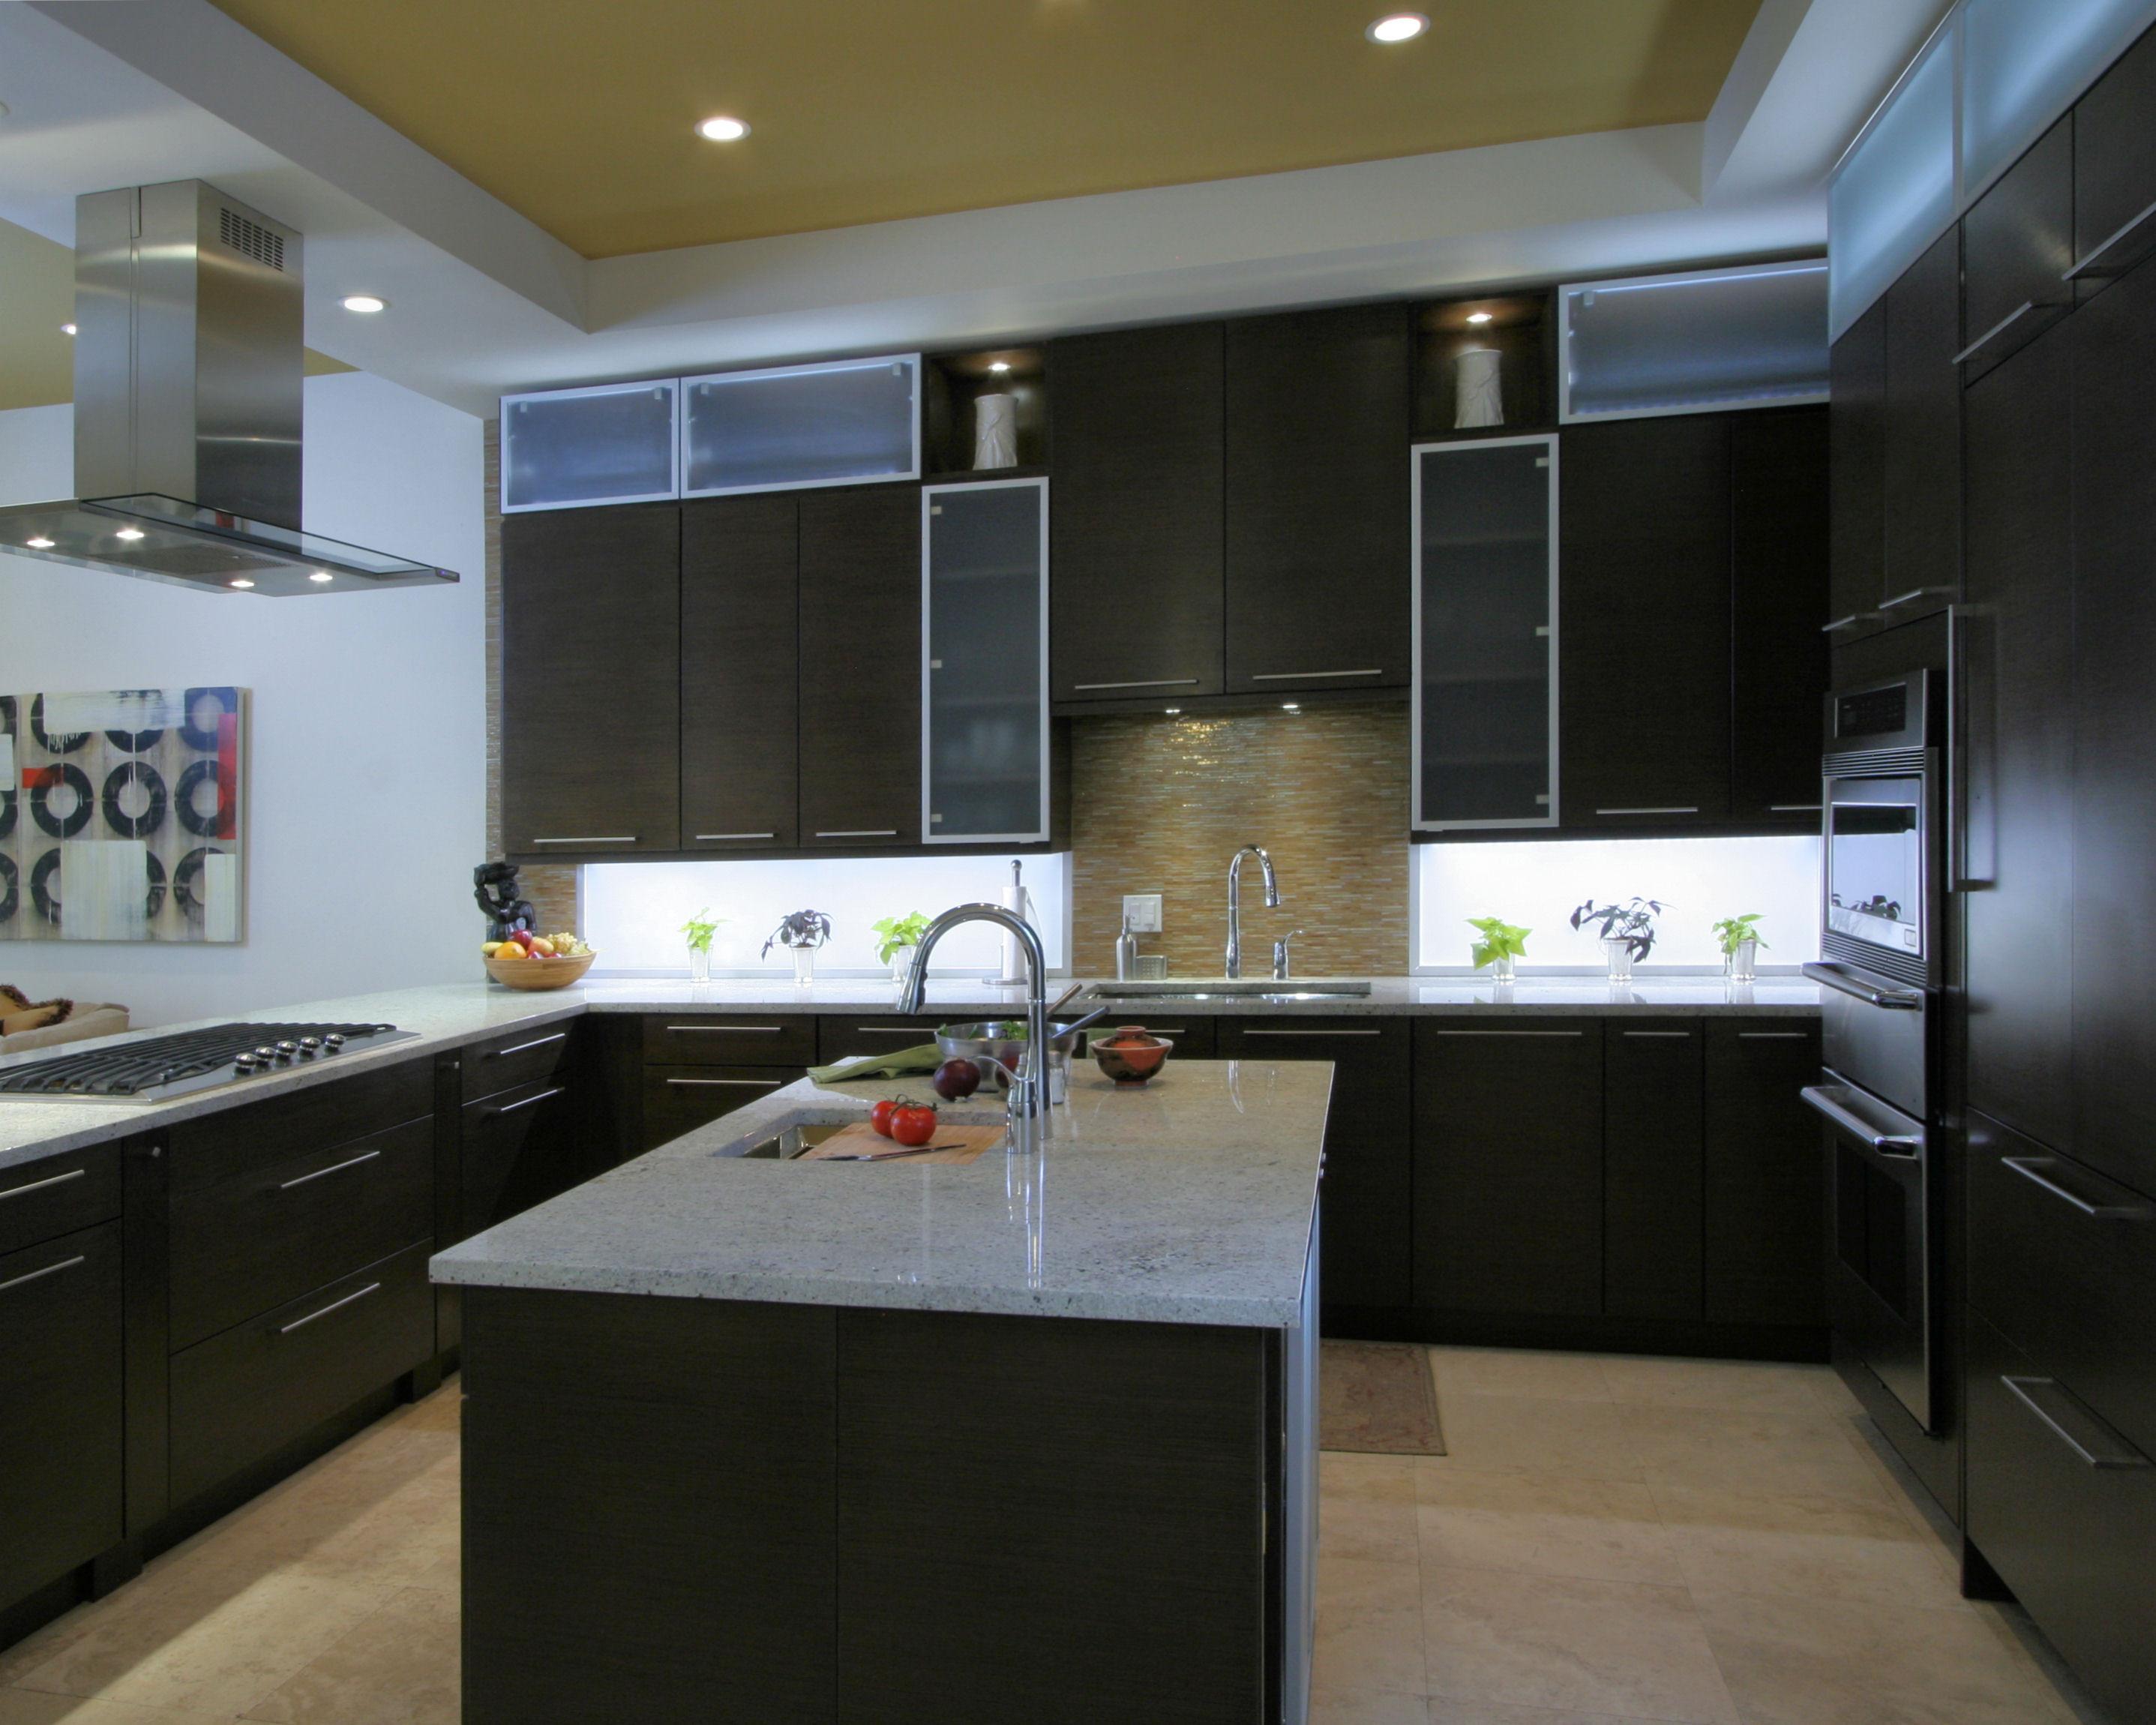 accent or task lighting kitchen under cabinet lighting kitchen under cabinet lighting great task lighting